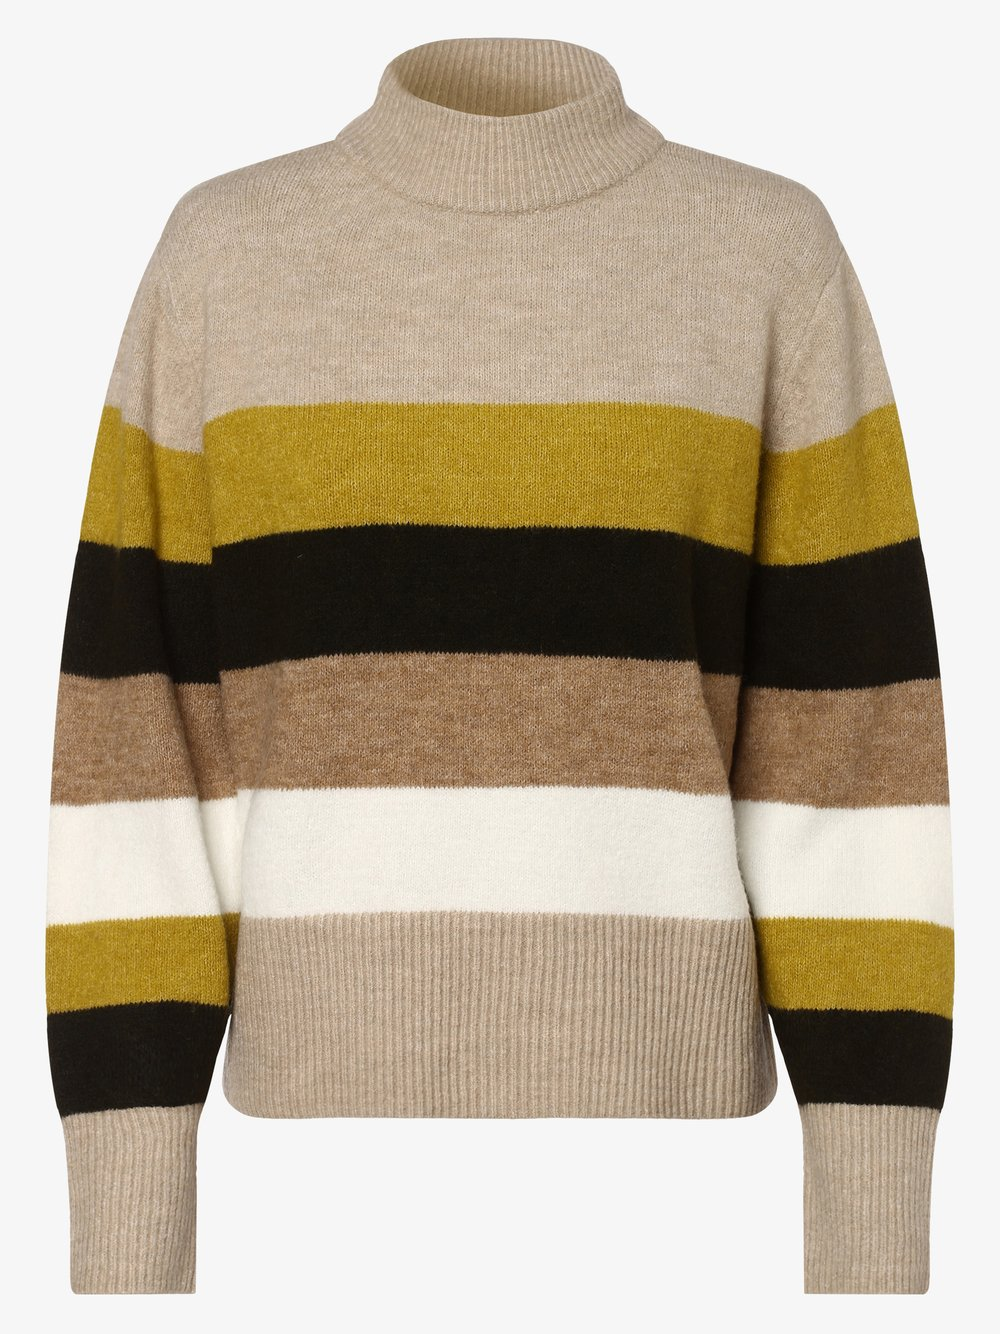 Opus - Sweter damski – Parko, beżowy